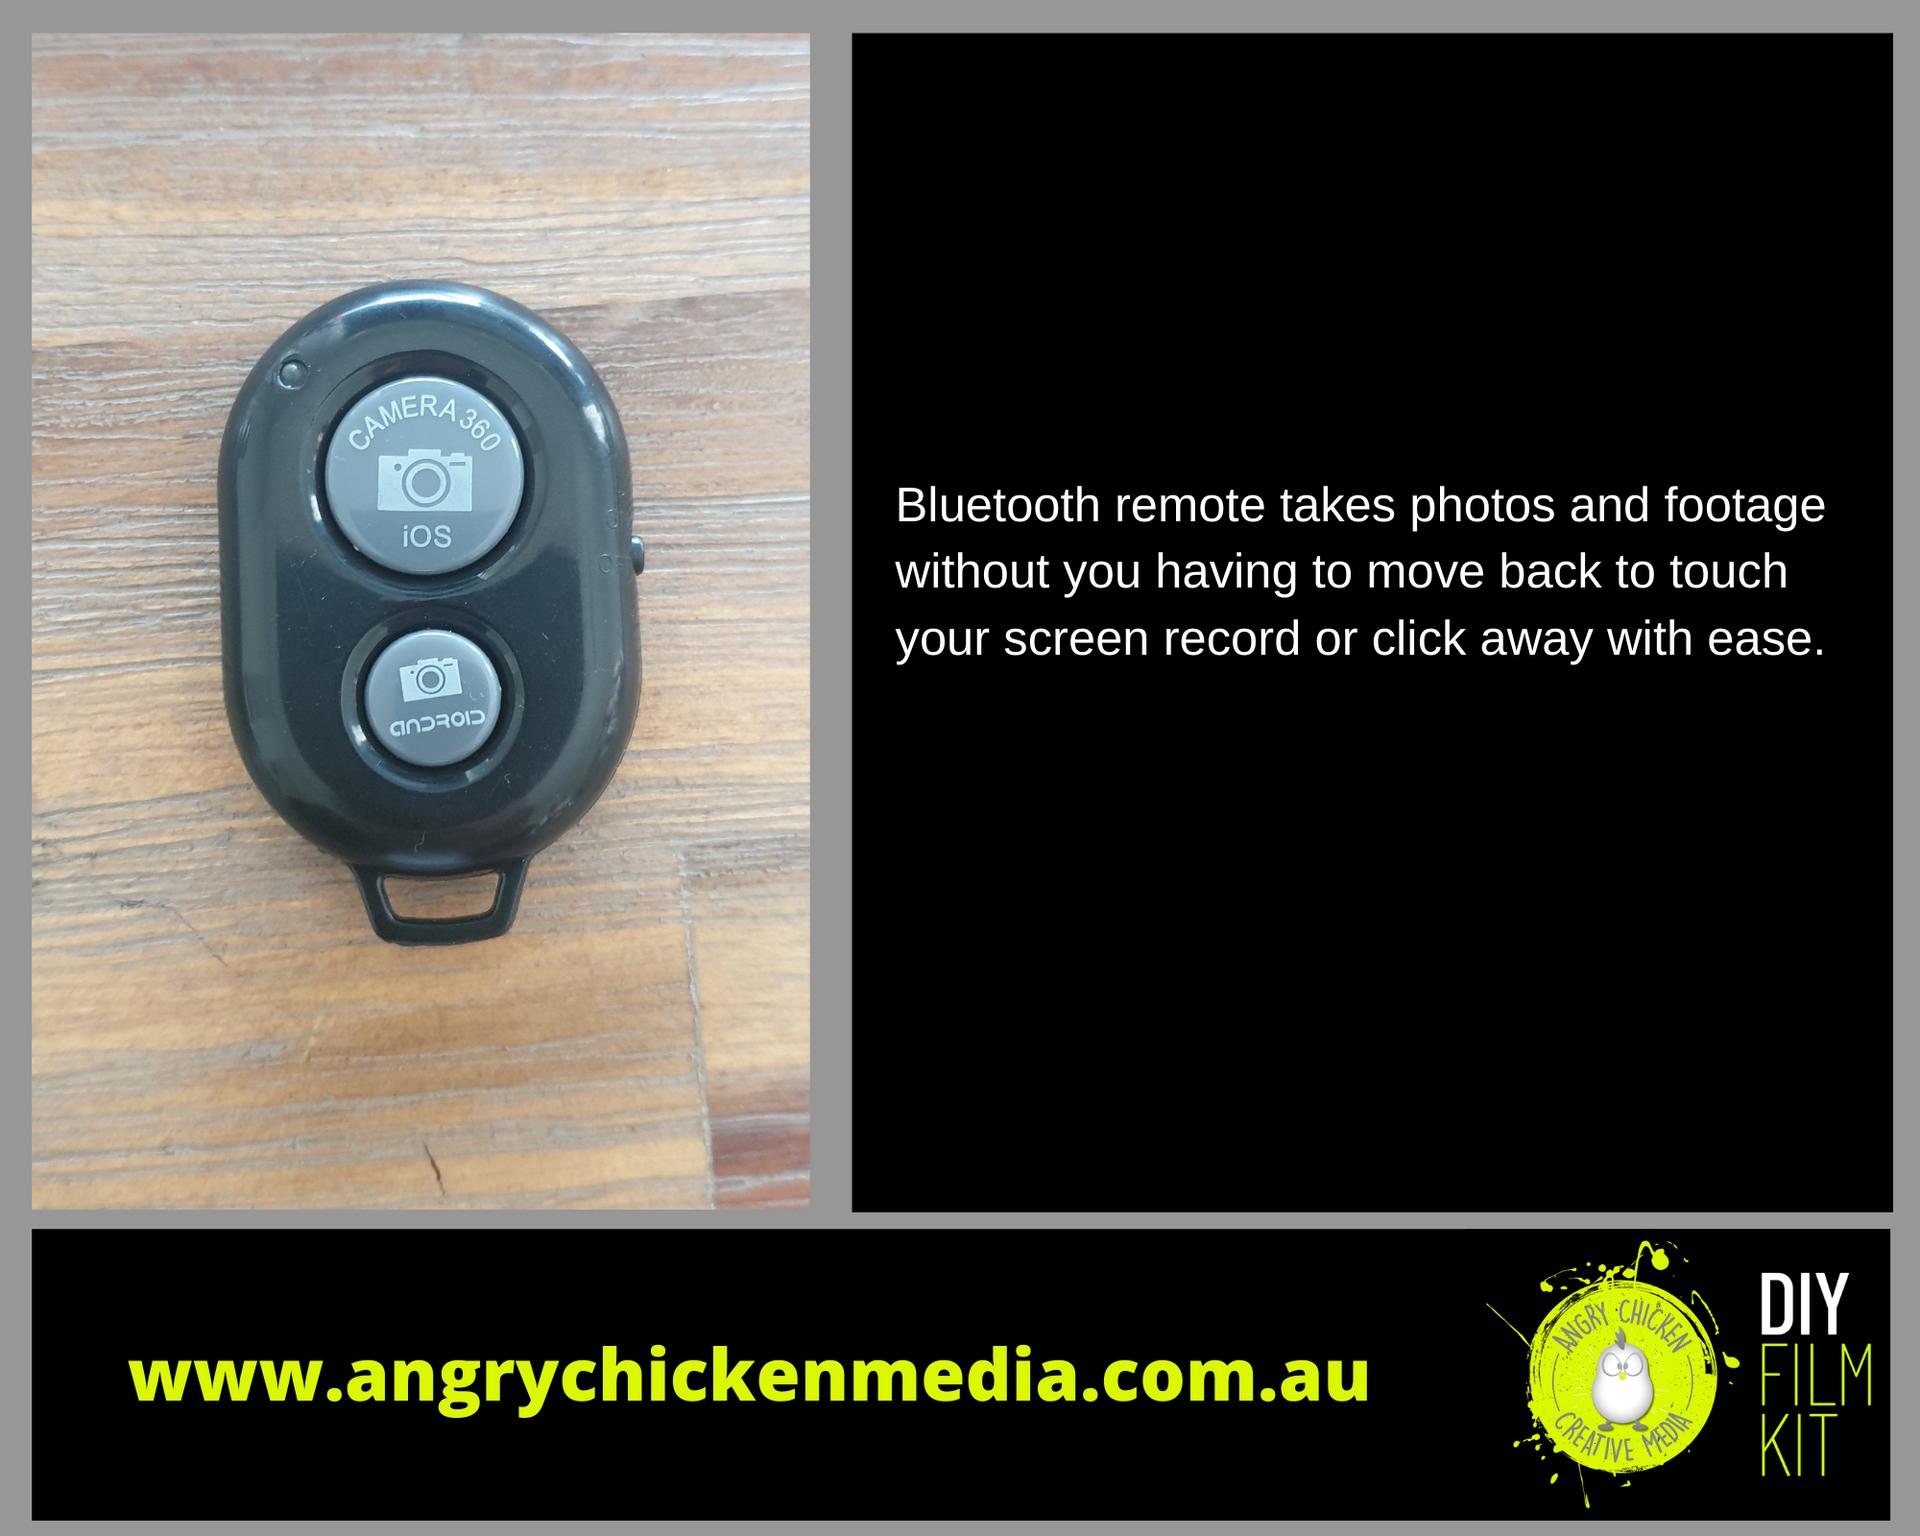 ACM DIY Film Kit bluetooth remote featur